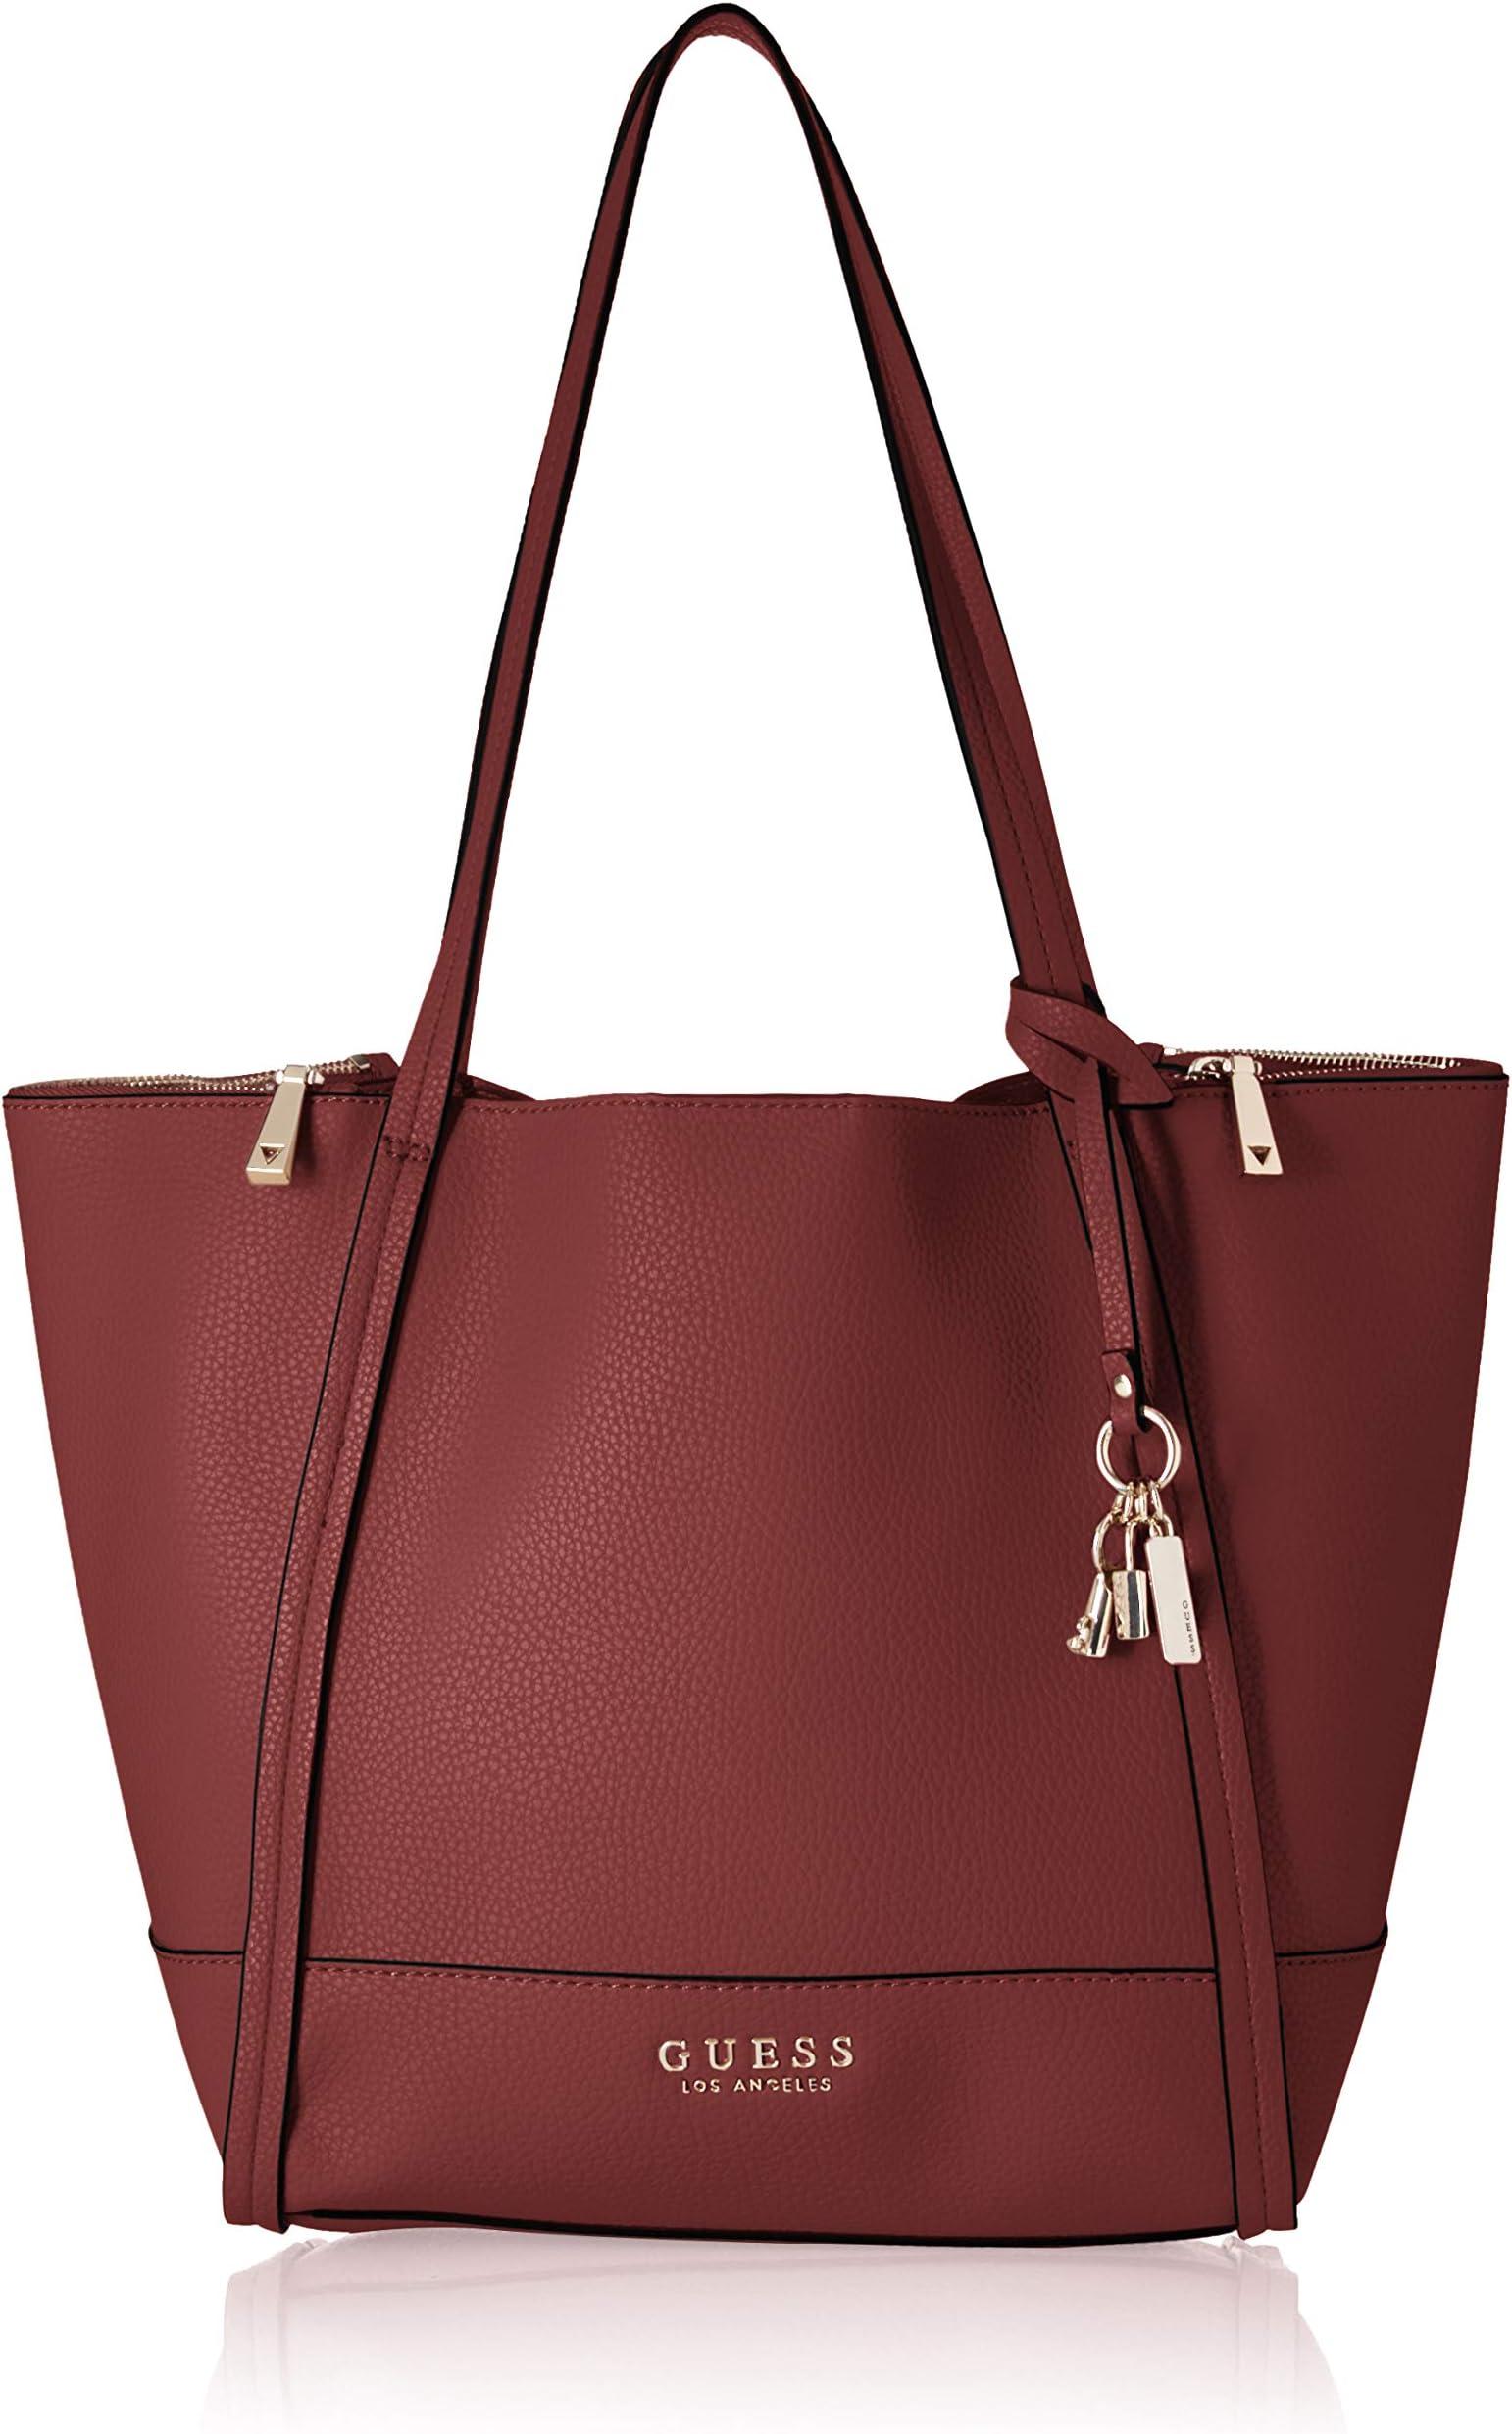 women s top handle handbags amazon com rh amazon com